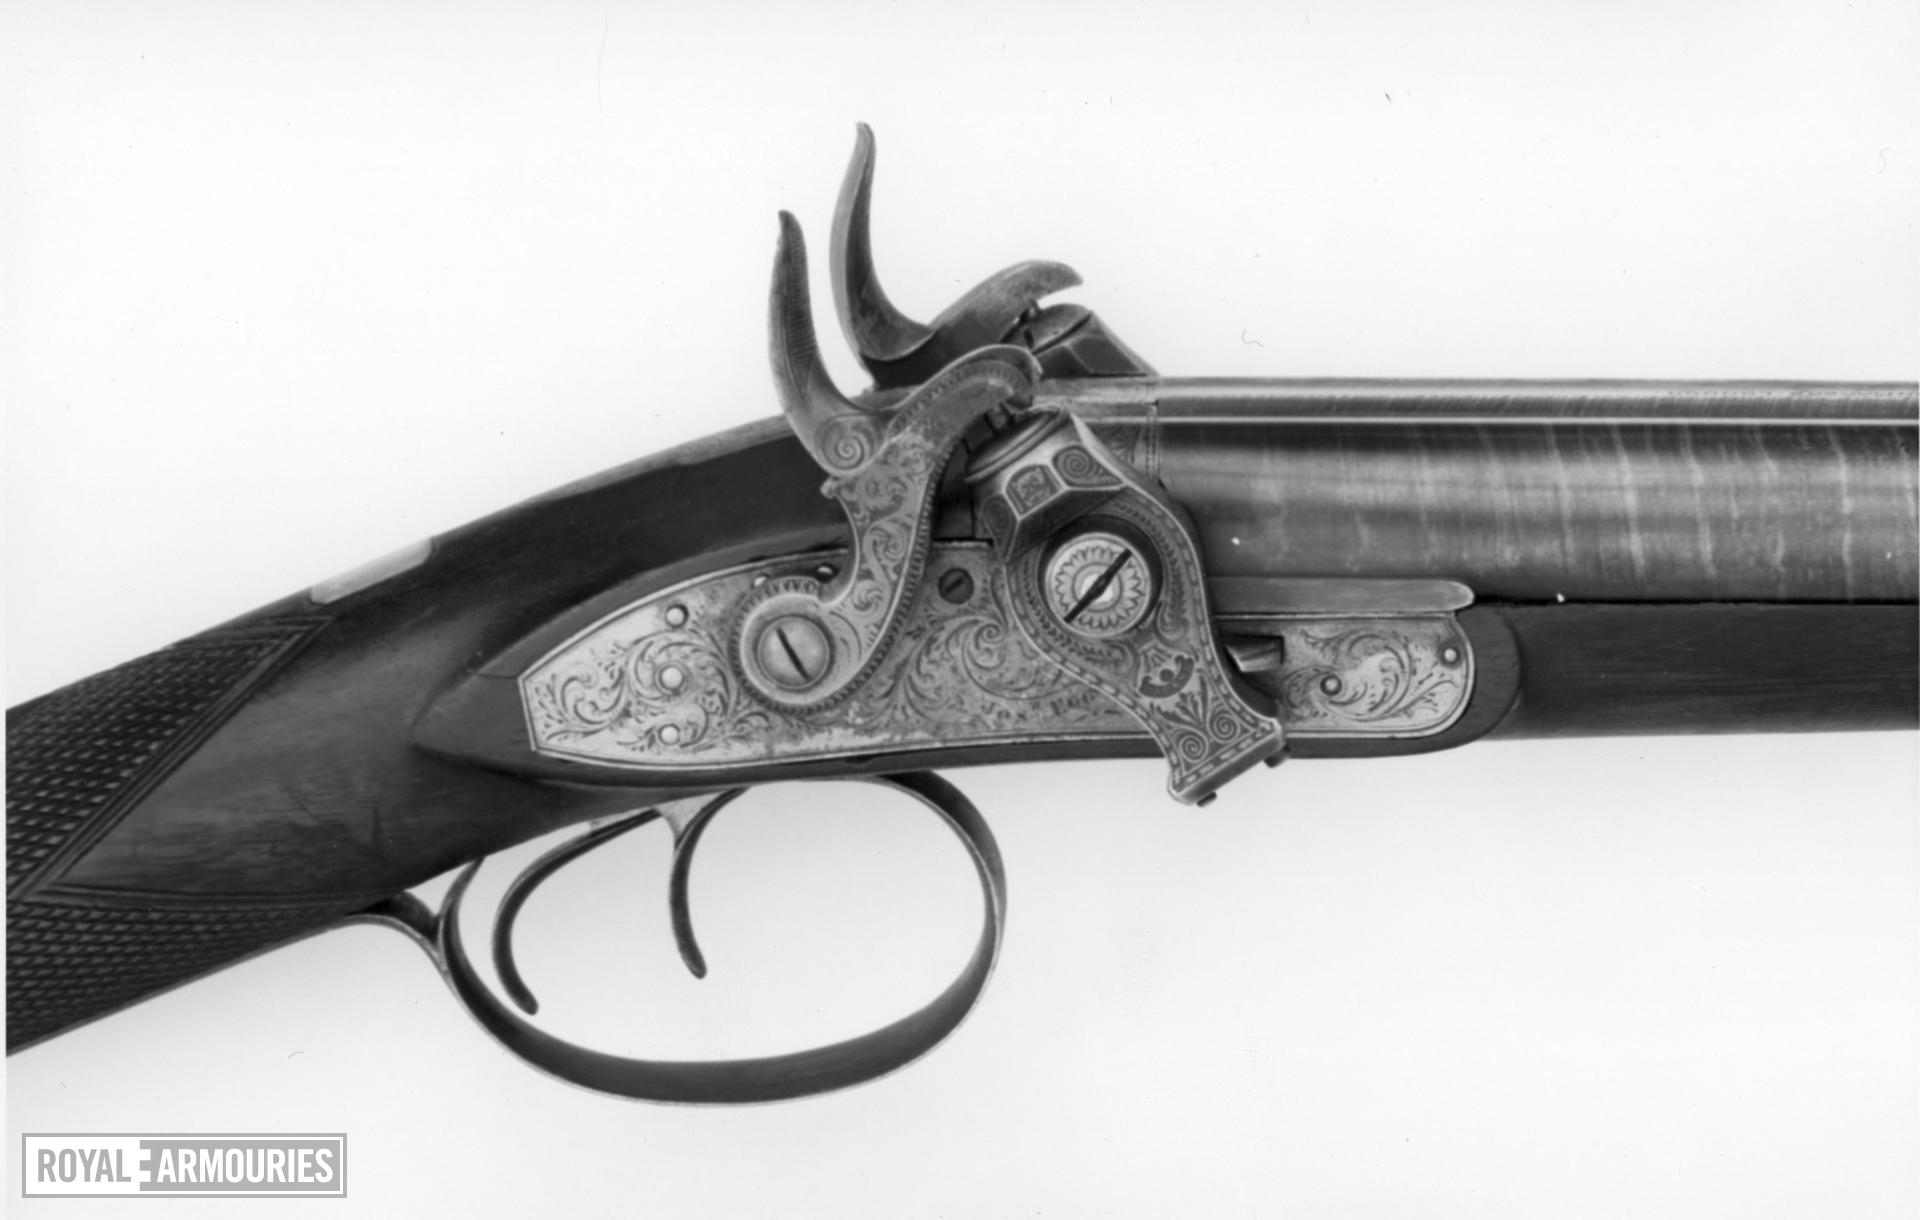 Percussion double-barrelled shotgun - By Joseph Egg